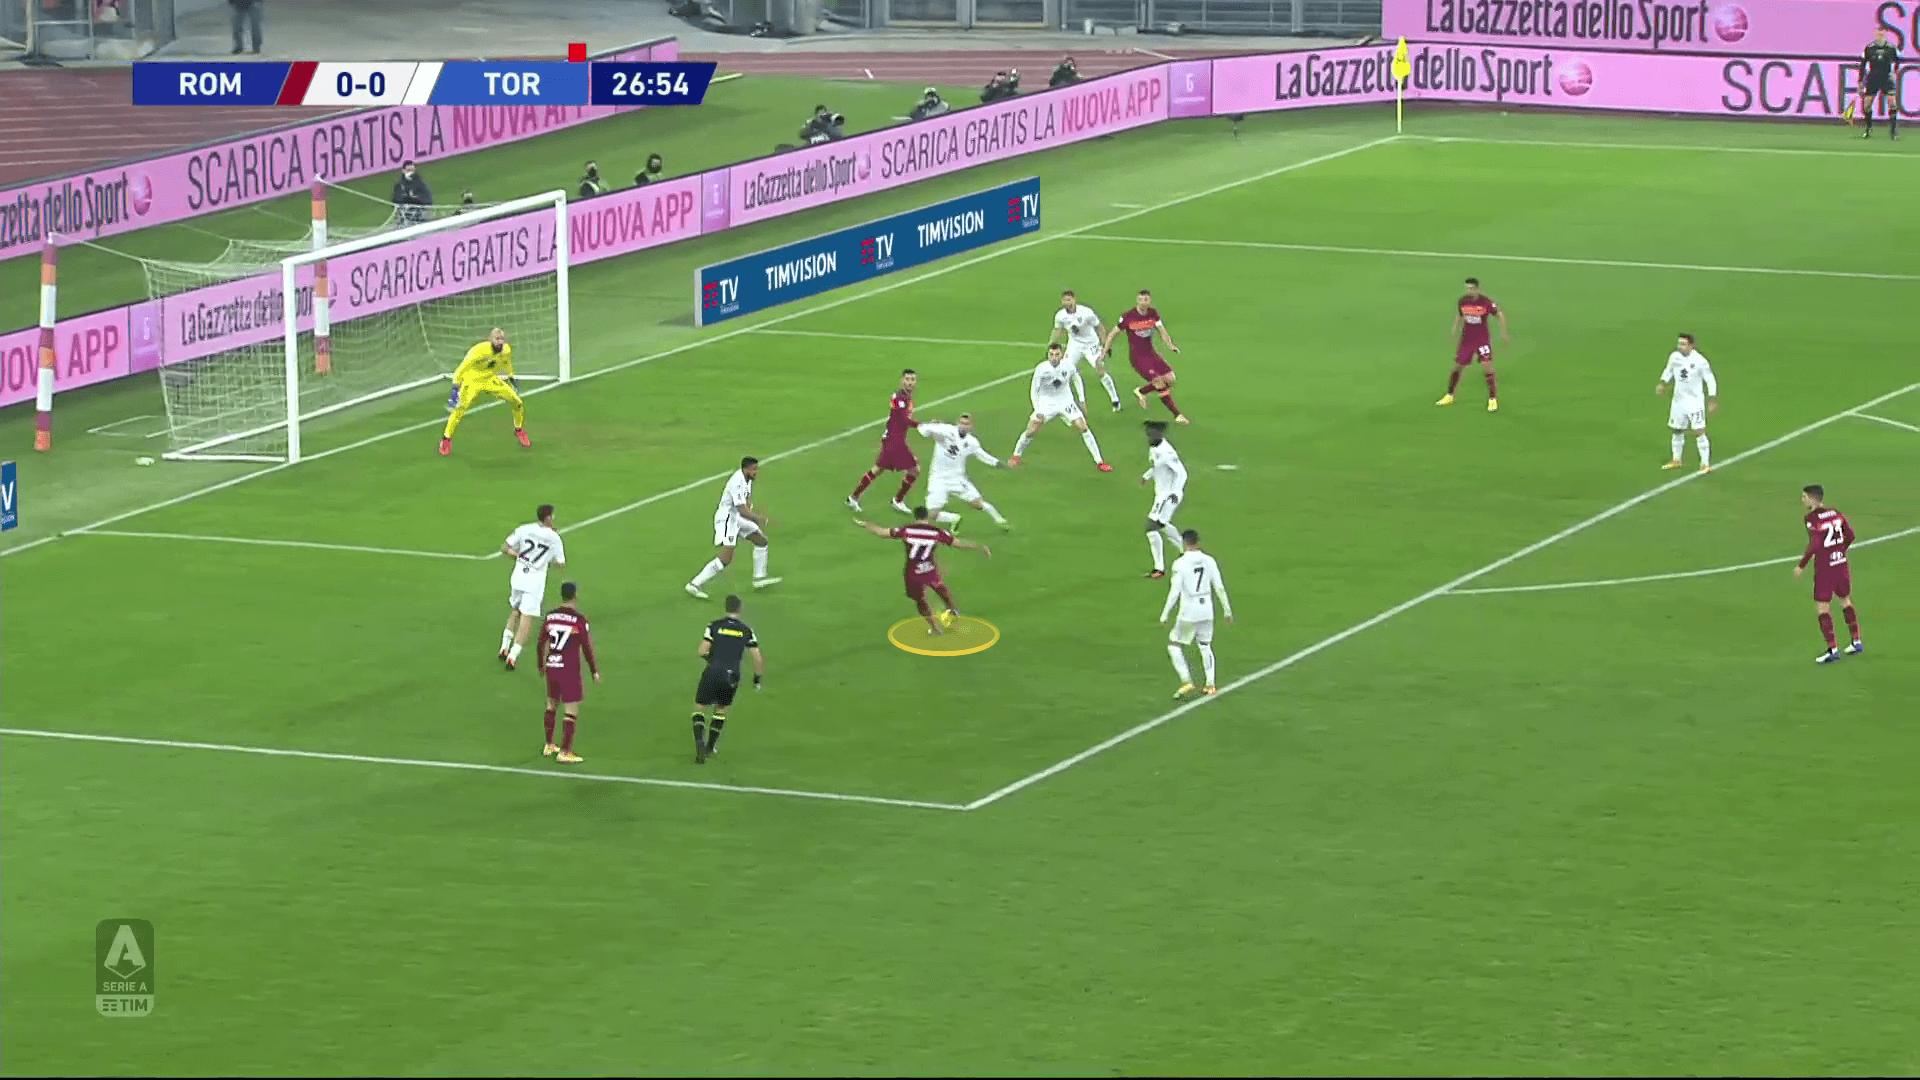 Henrikh Mkhitaryan: Arsenal flop to key man in Rome - scout report tactical analysis tactics